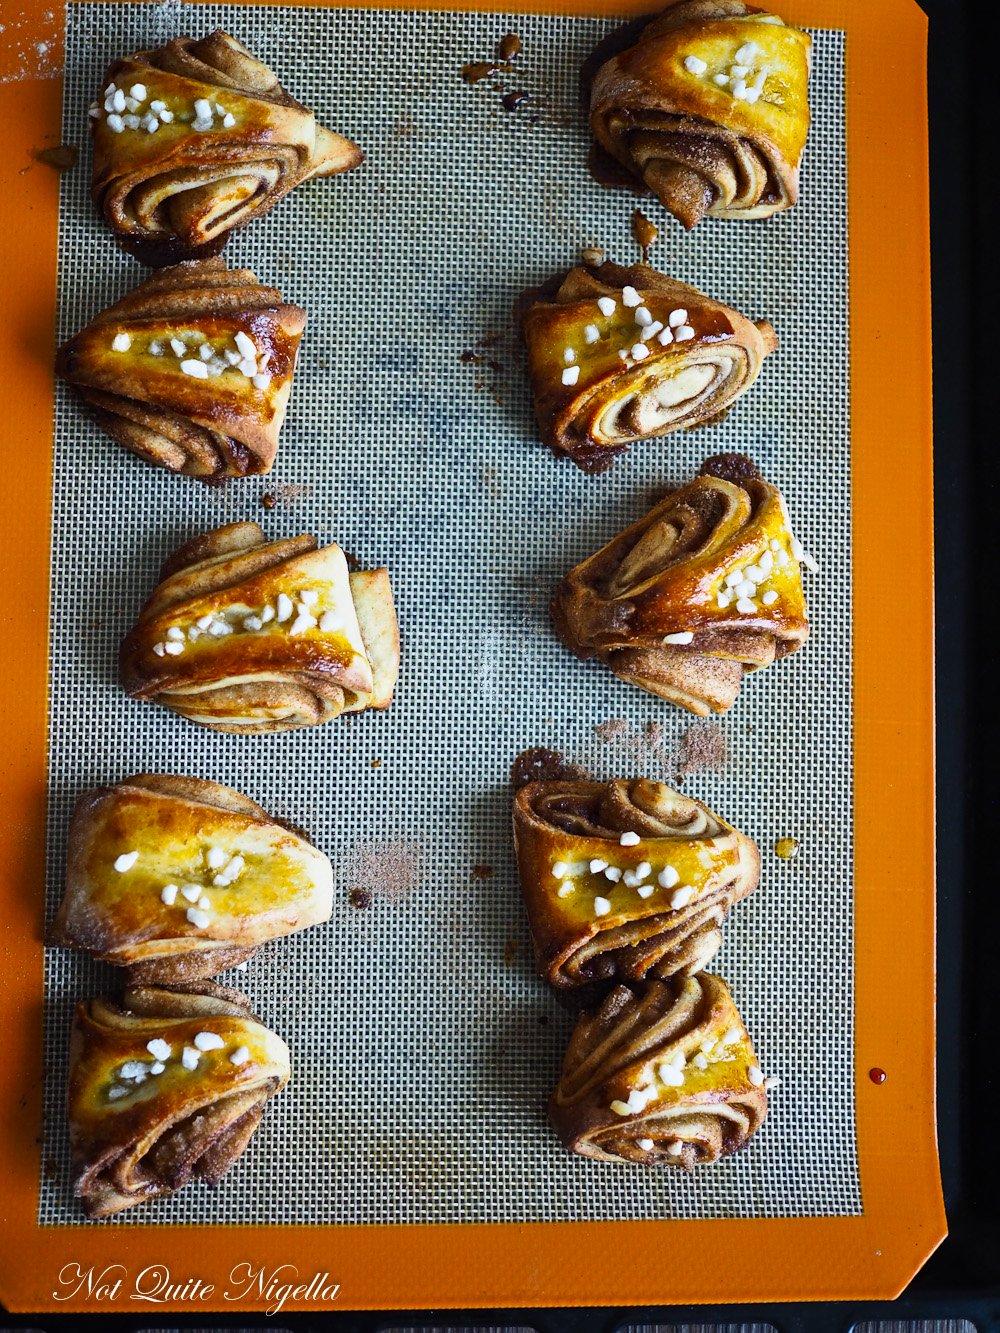 Korvapuusti Finnish Cinnamon Cardamom Buns